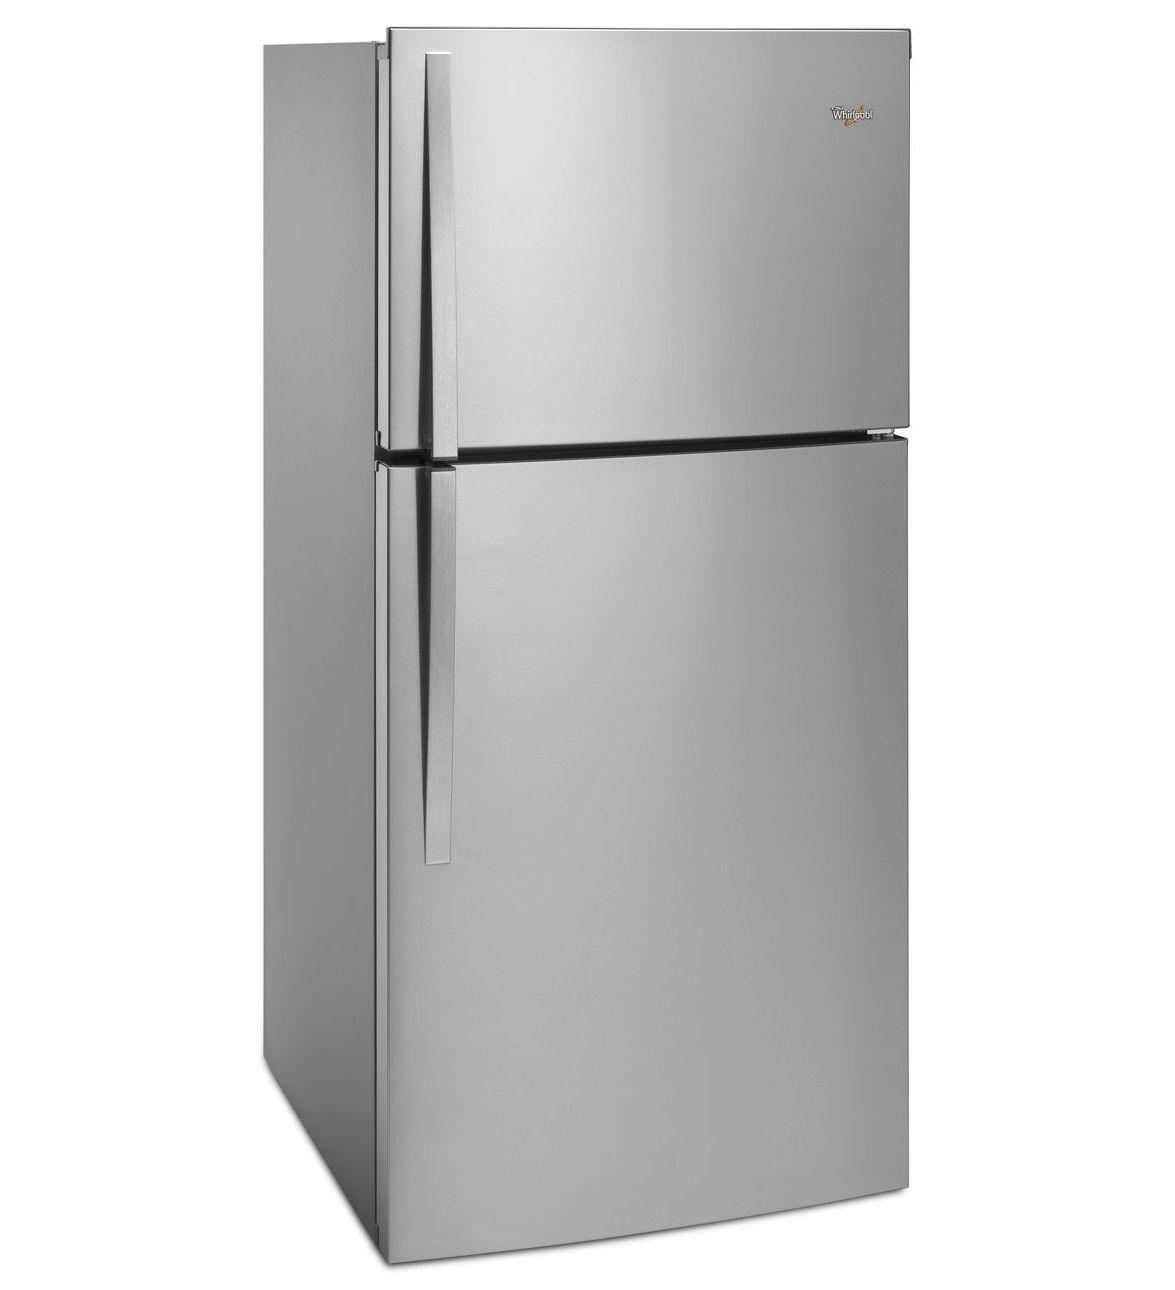 Wrt549szd Whirlpool Wrt549szd Top Freezer Refrigerators